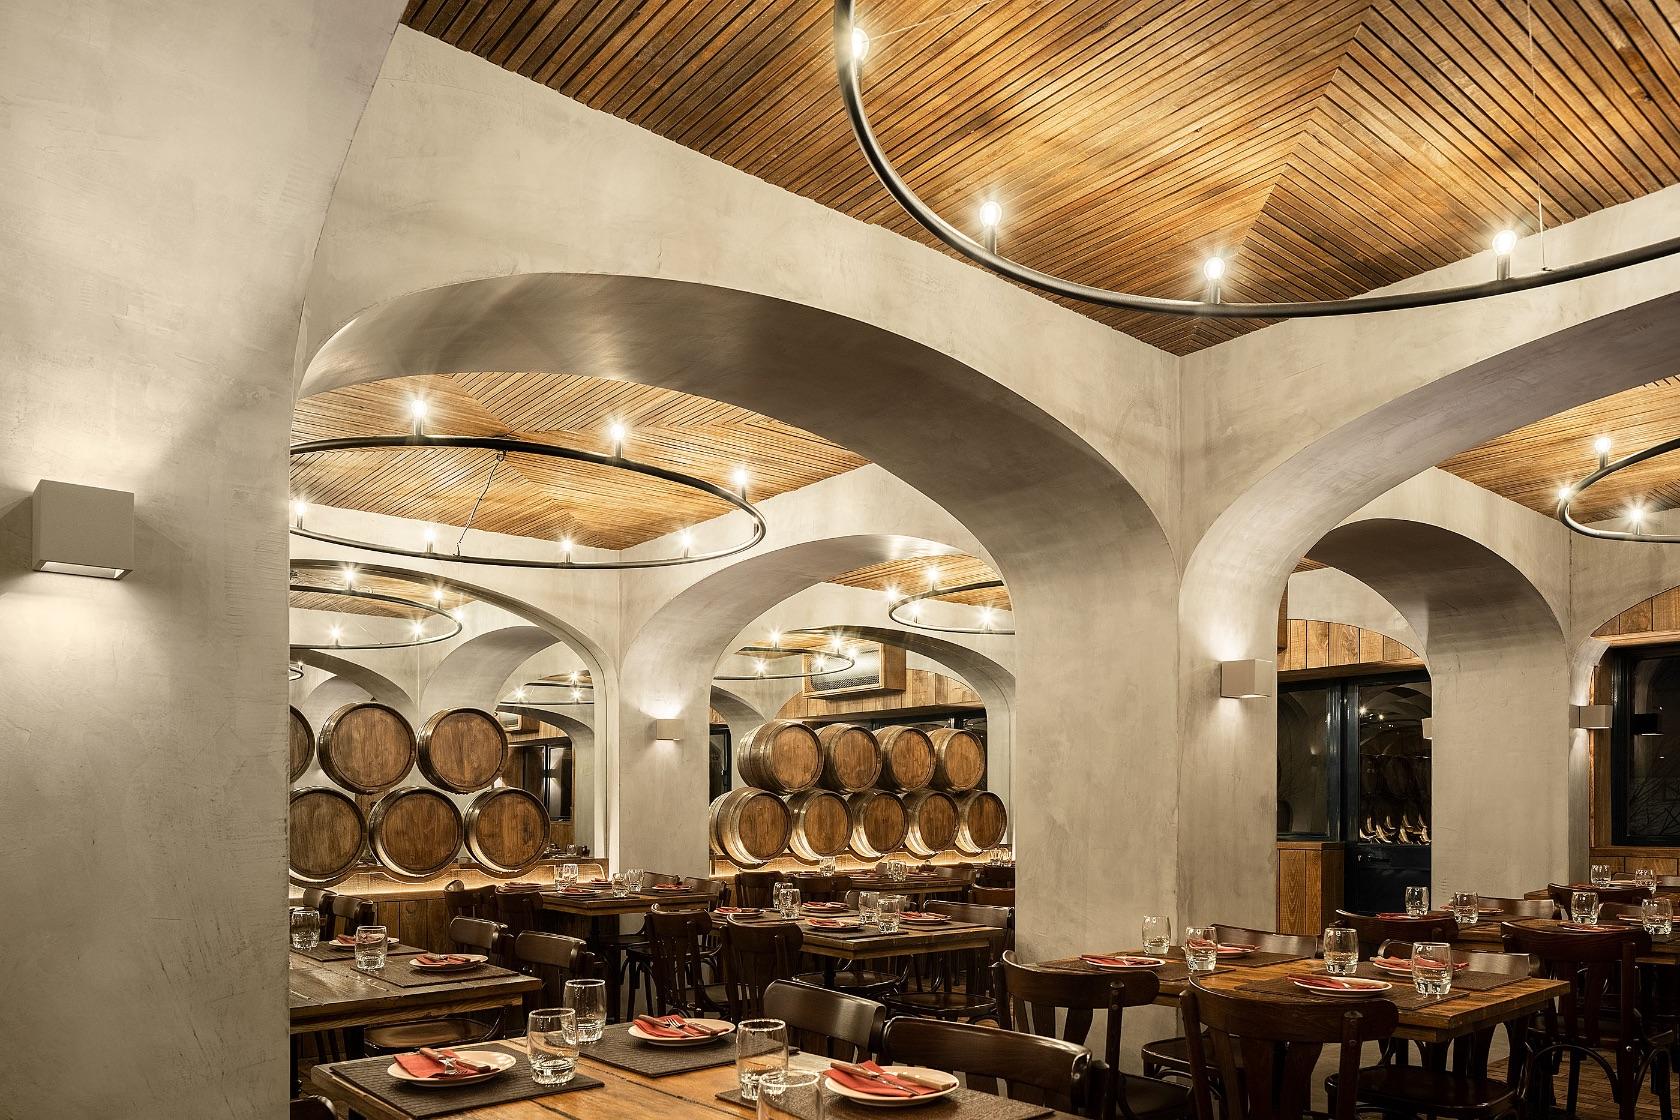 7_BARRIL Restaurant_PAULO MERLINI Architects_Inspirationist